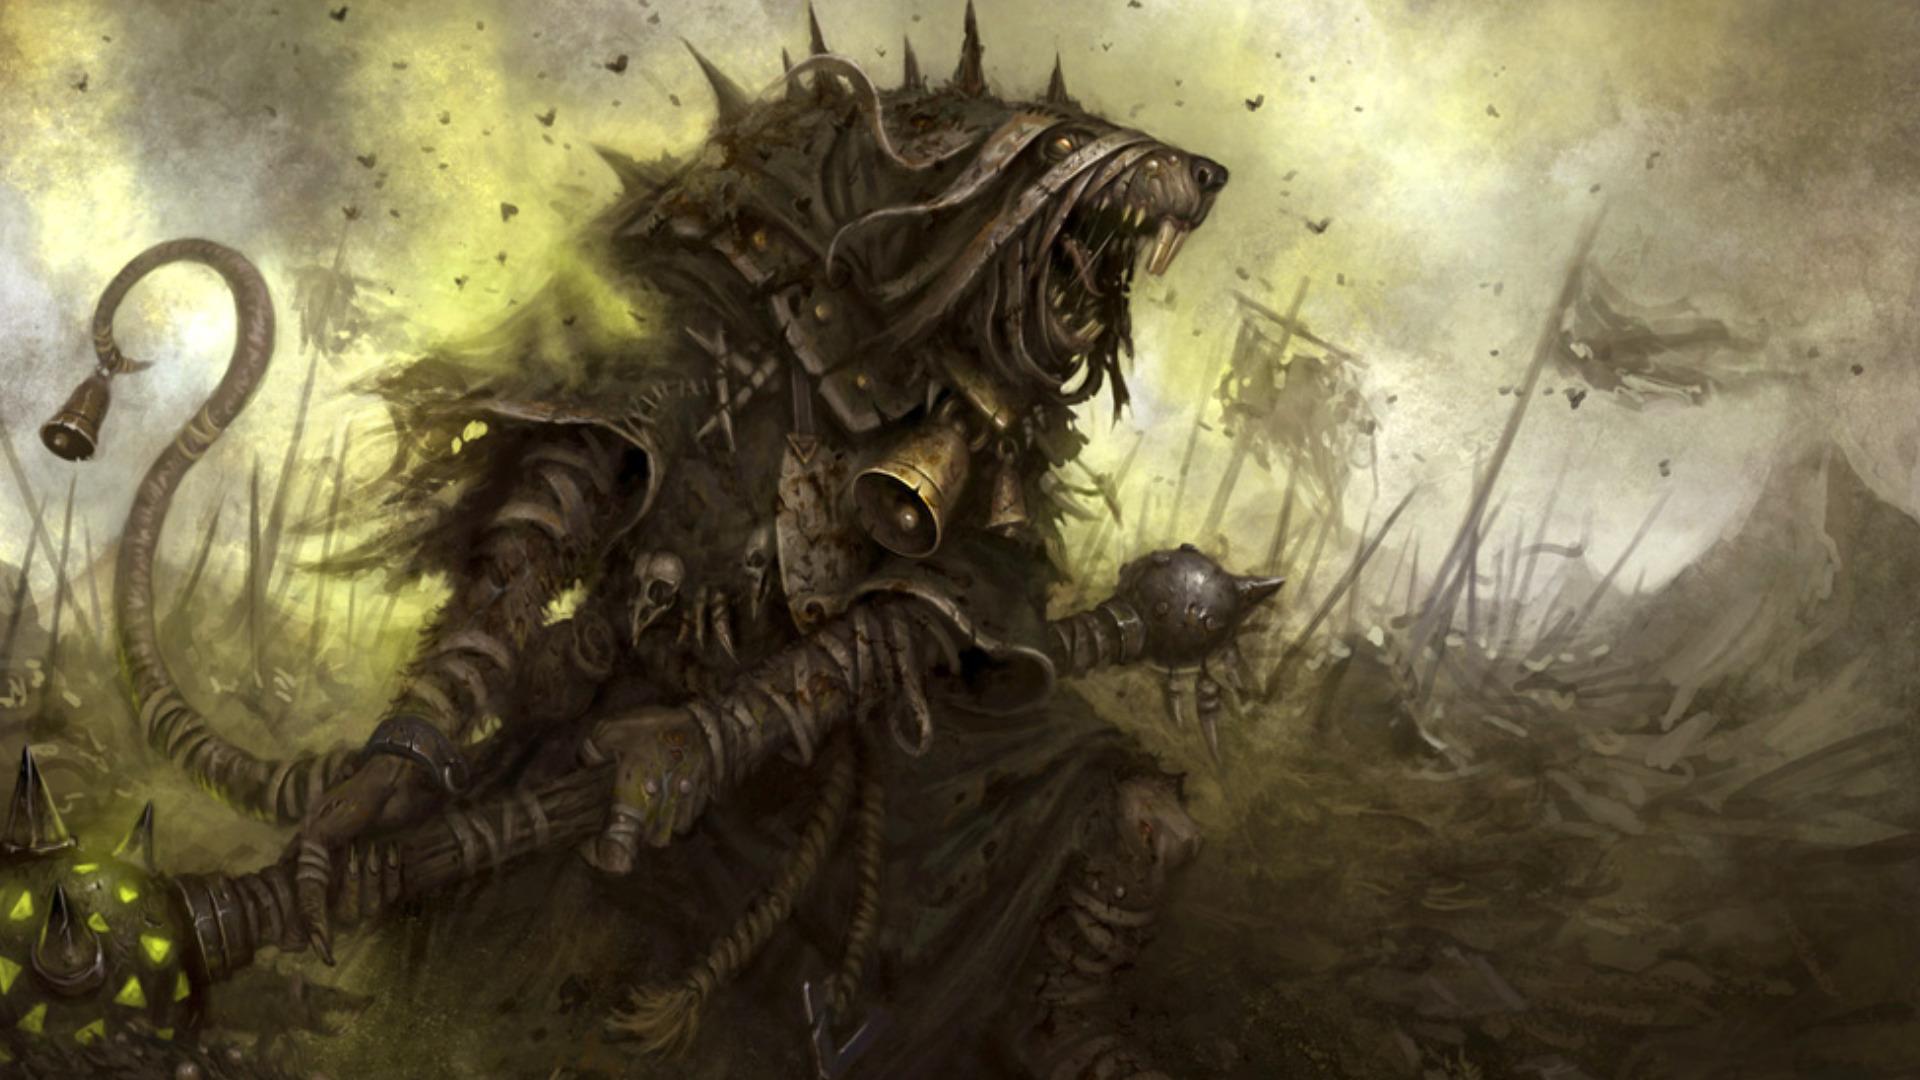 Warhammer Fantasy Art Gallery